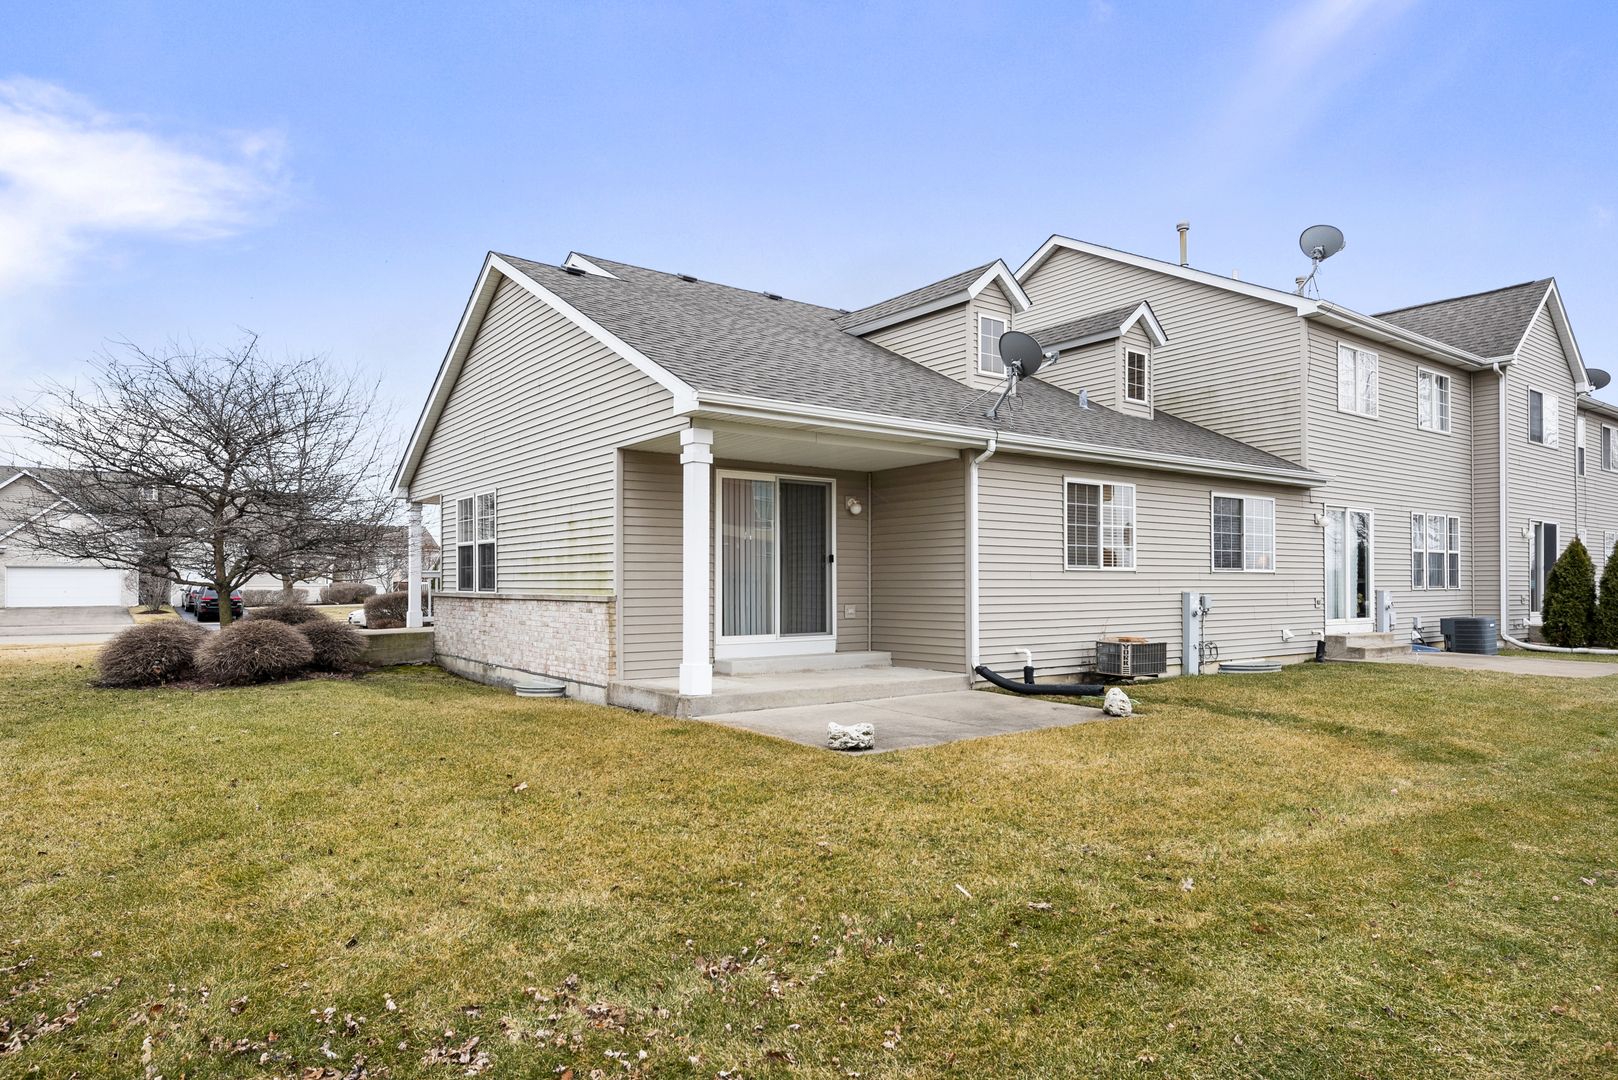 25650 South BRIDLE PATH 1, Channahon, Illinois, 60410